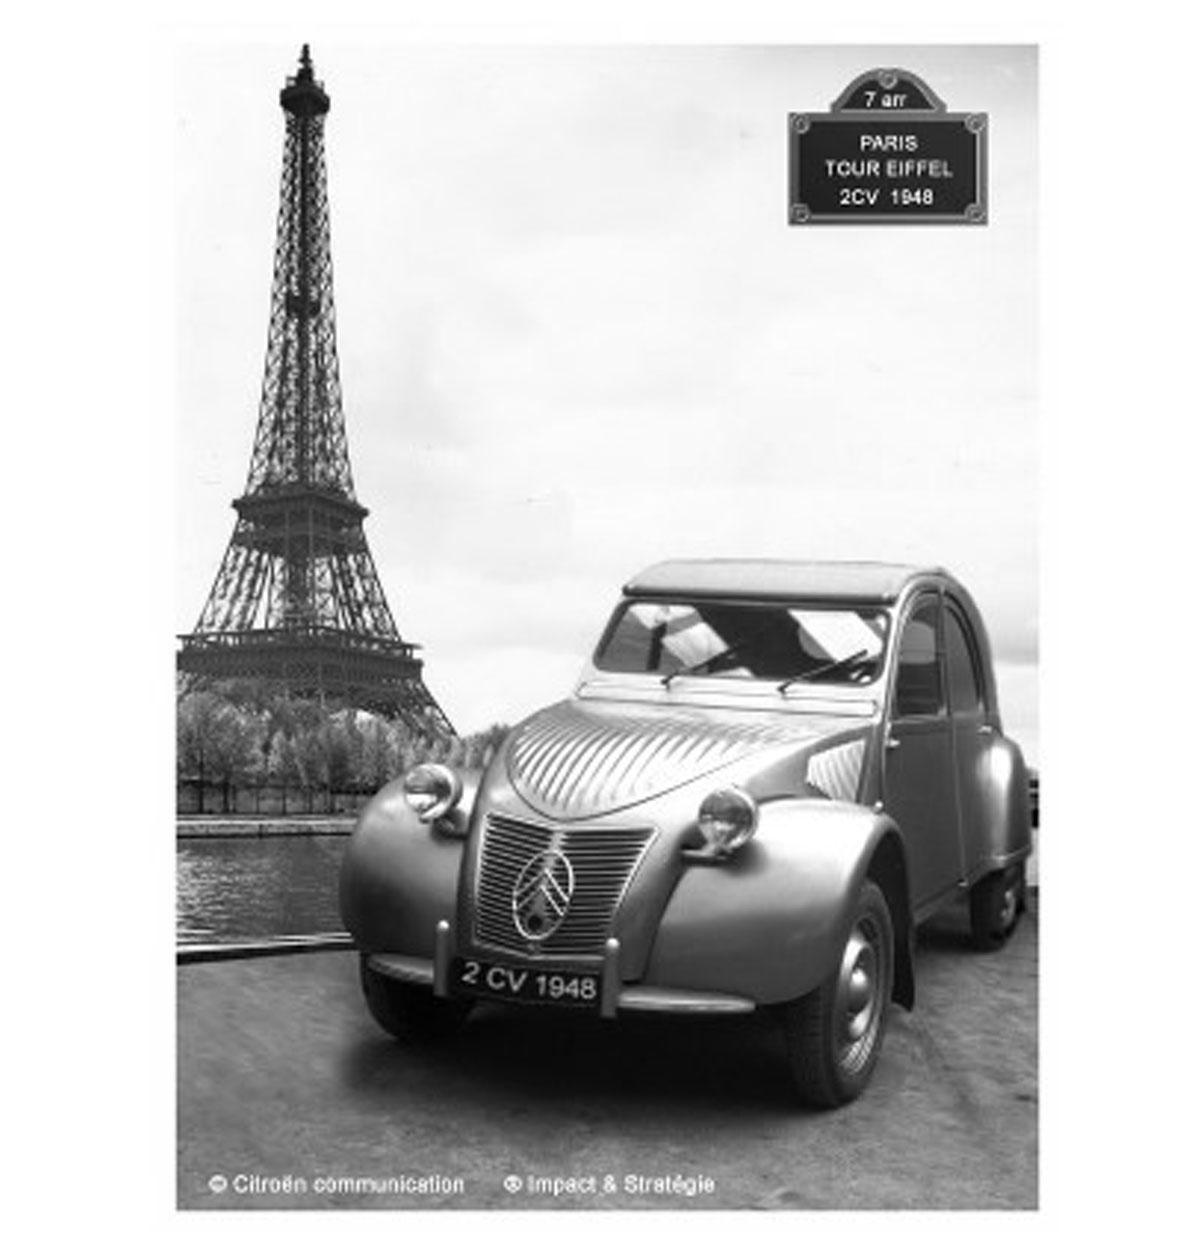 Citroën Paris Tour Eiffel Tinnen Bord